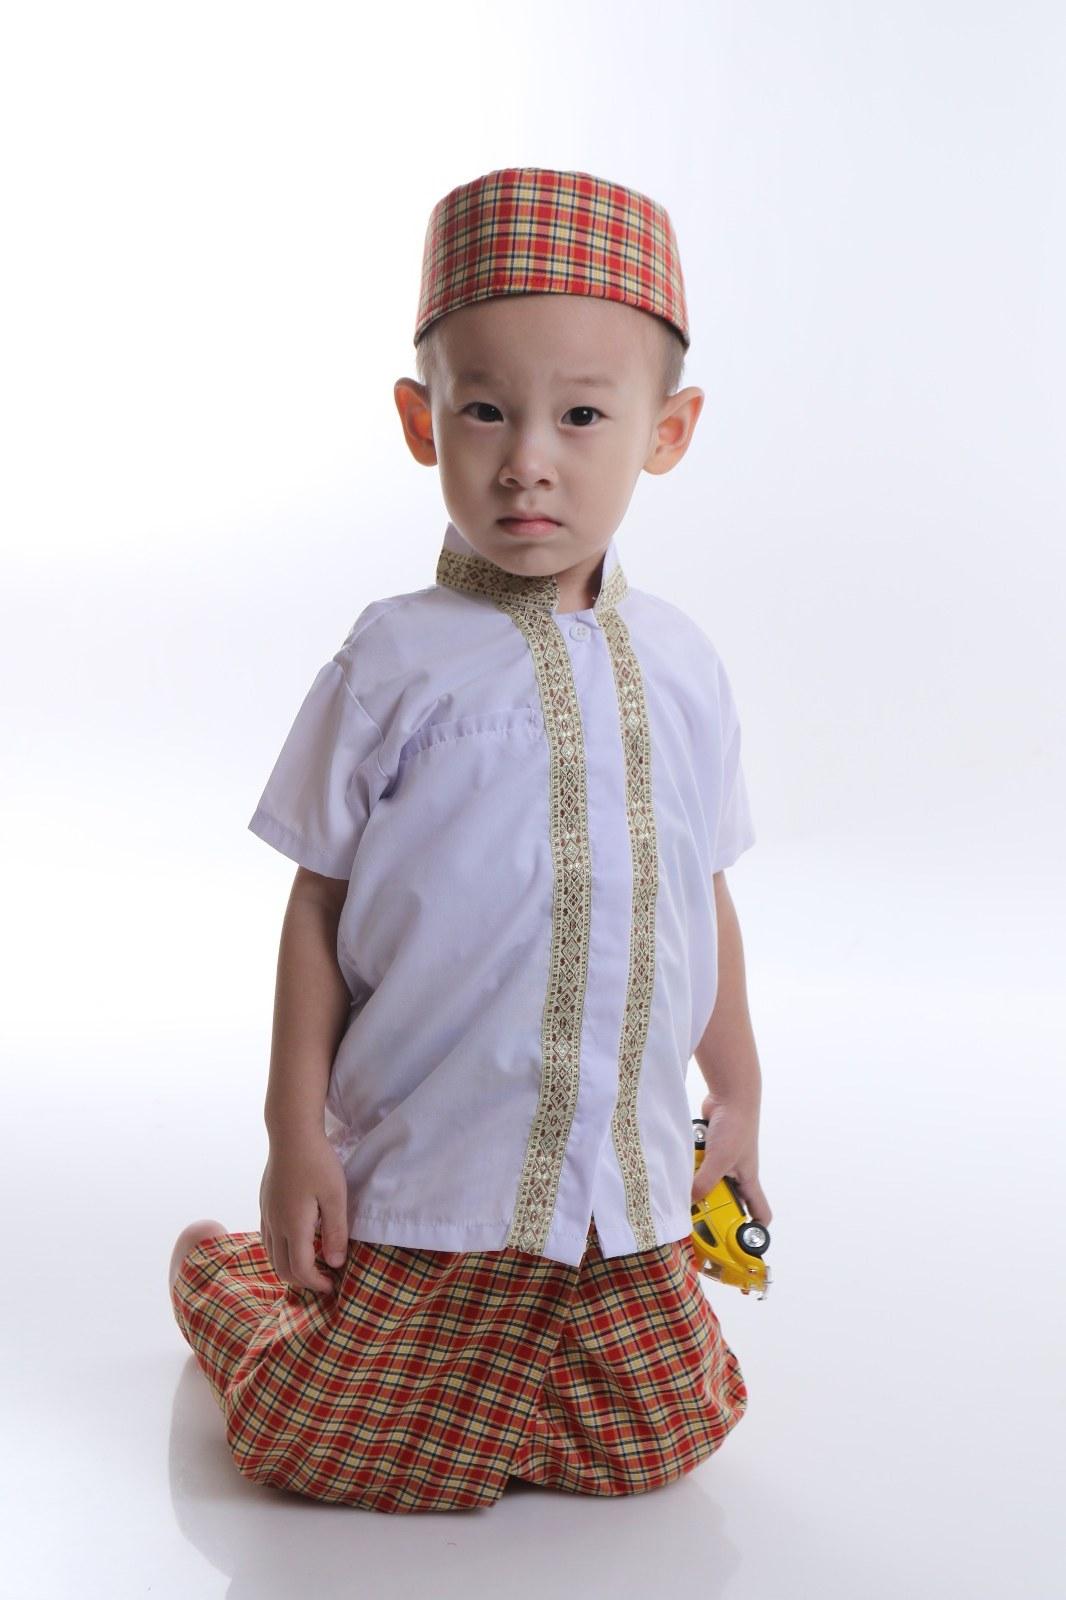 Bentuk Baju Lebaran Anak Laki Laki 2018 Dddy Model Baju Muslim Untuk Anak Laki Laki Desain Terbaru